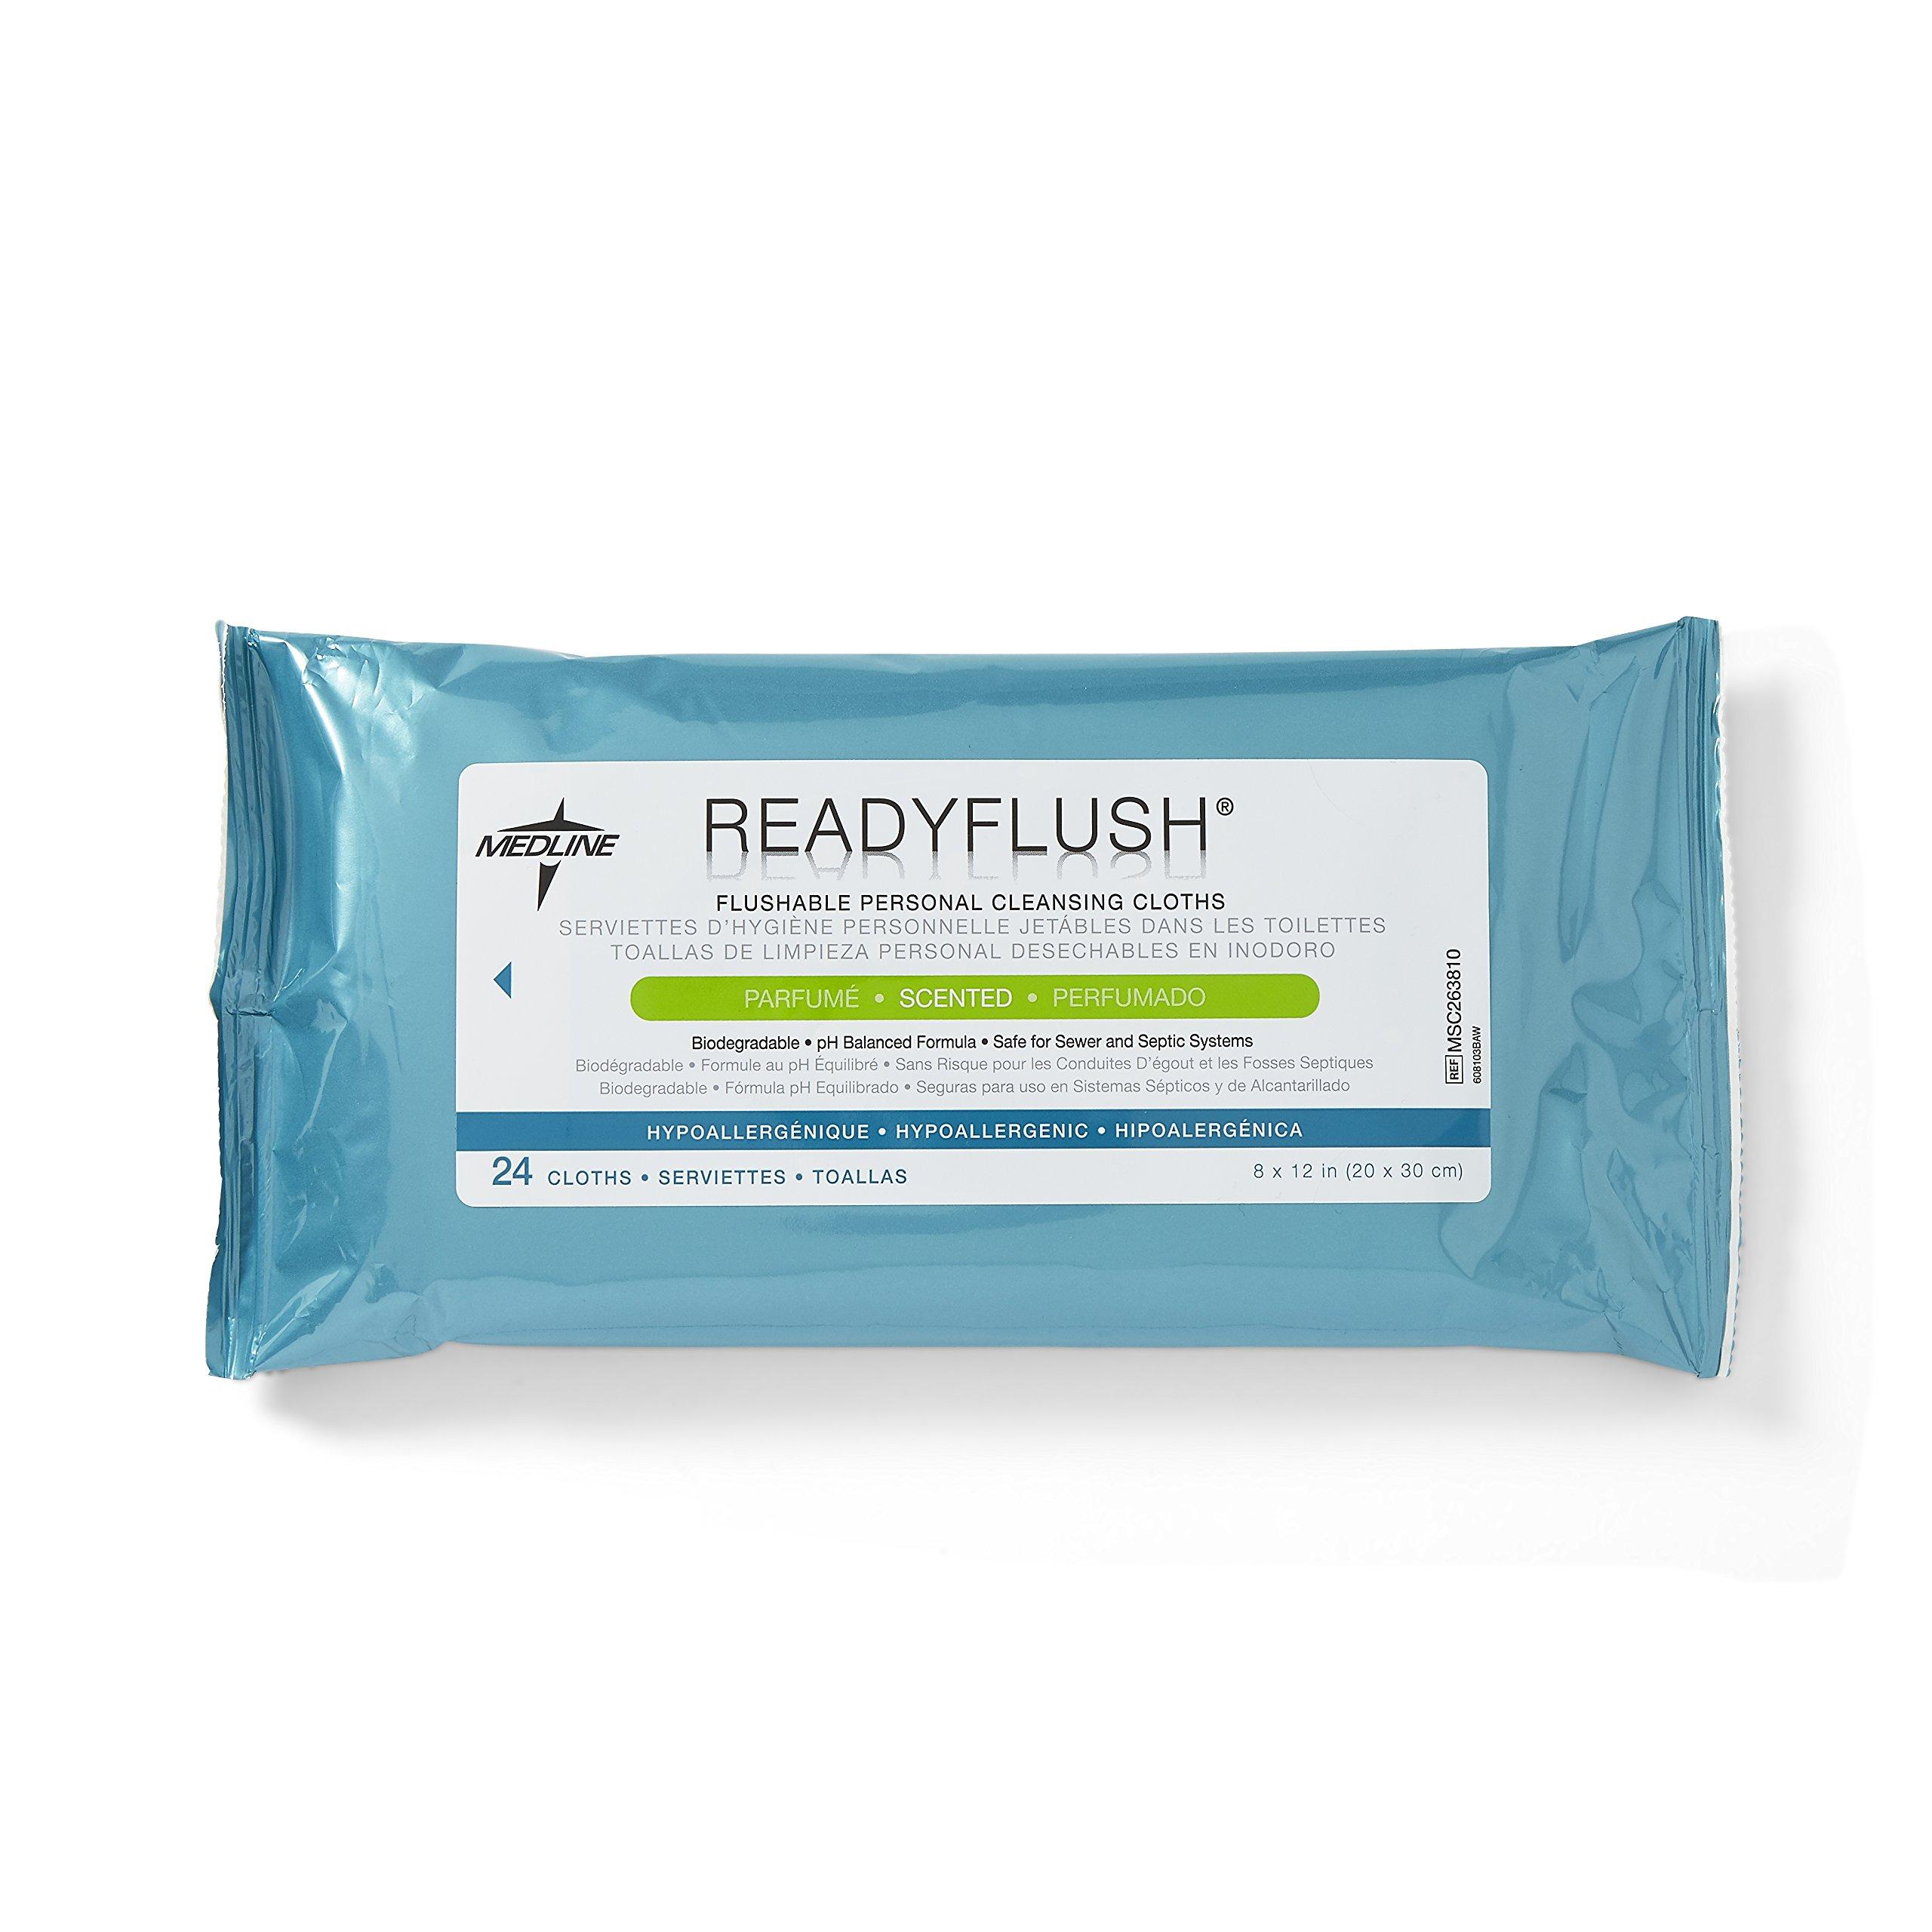 Medline Readyflush Biodegradable Flushable Wipes, 576 wipes (24 pack of 24 wipes)